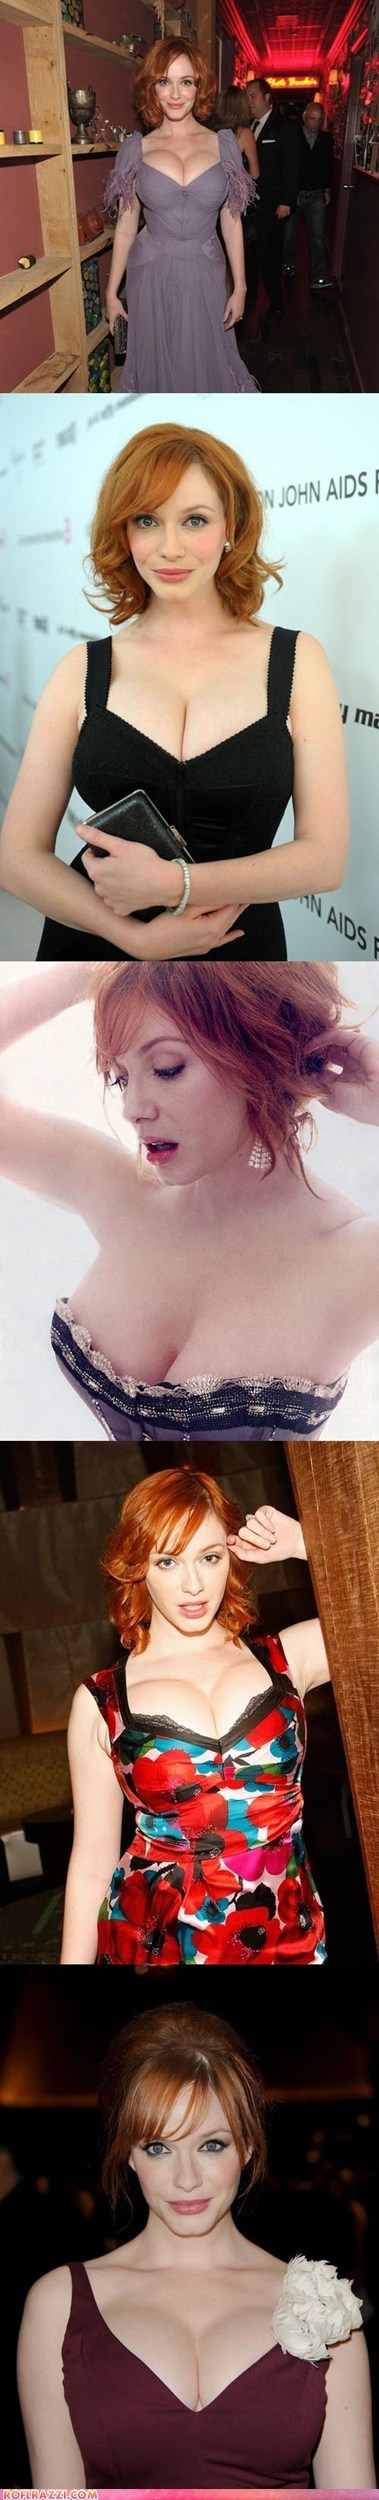 celeb Christina Hendricks dairy queen funny holiday sexy - 6049605120